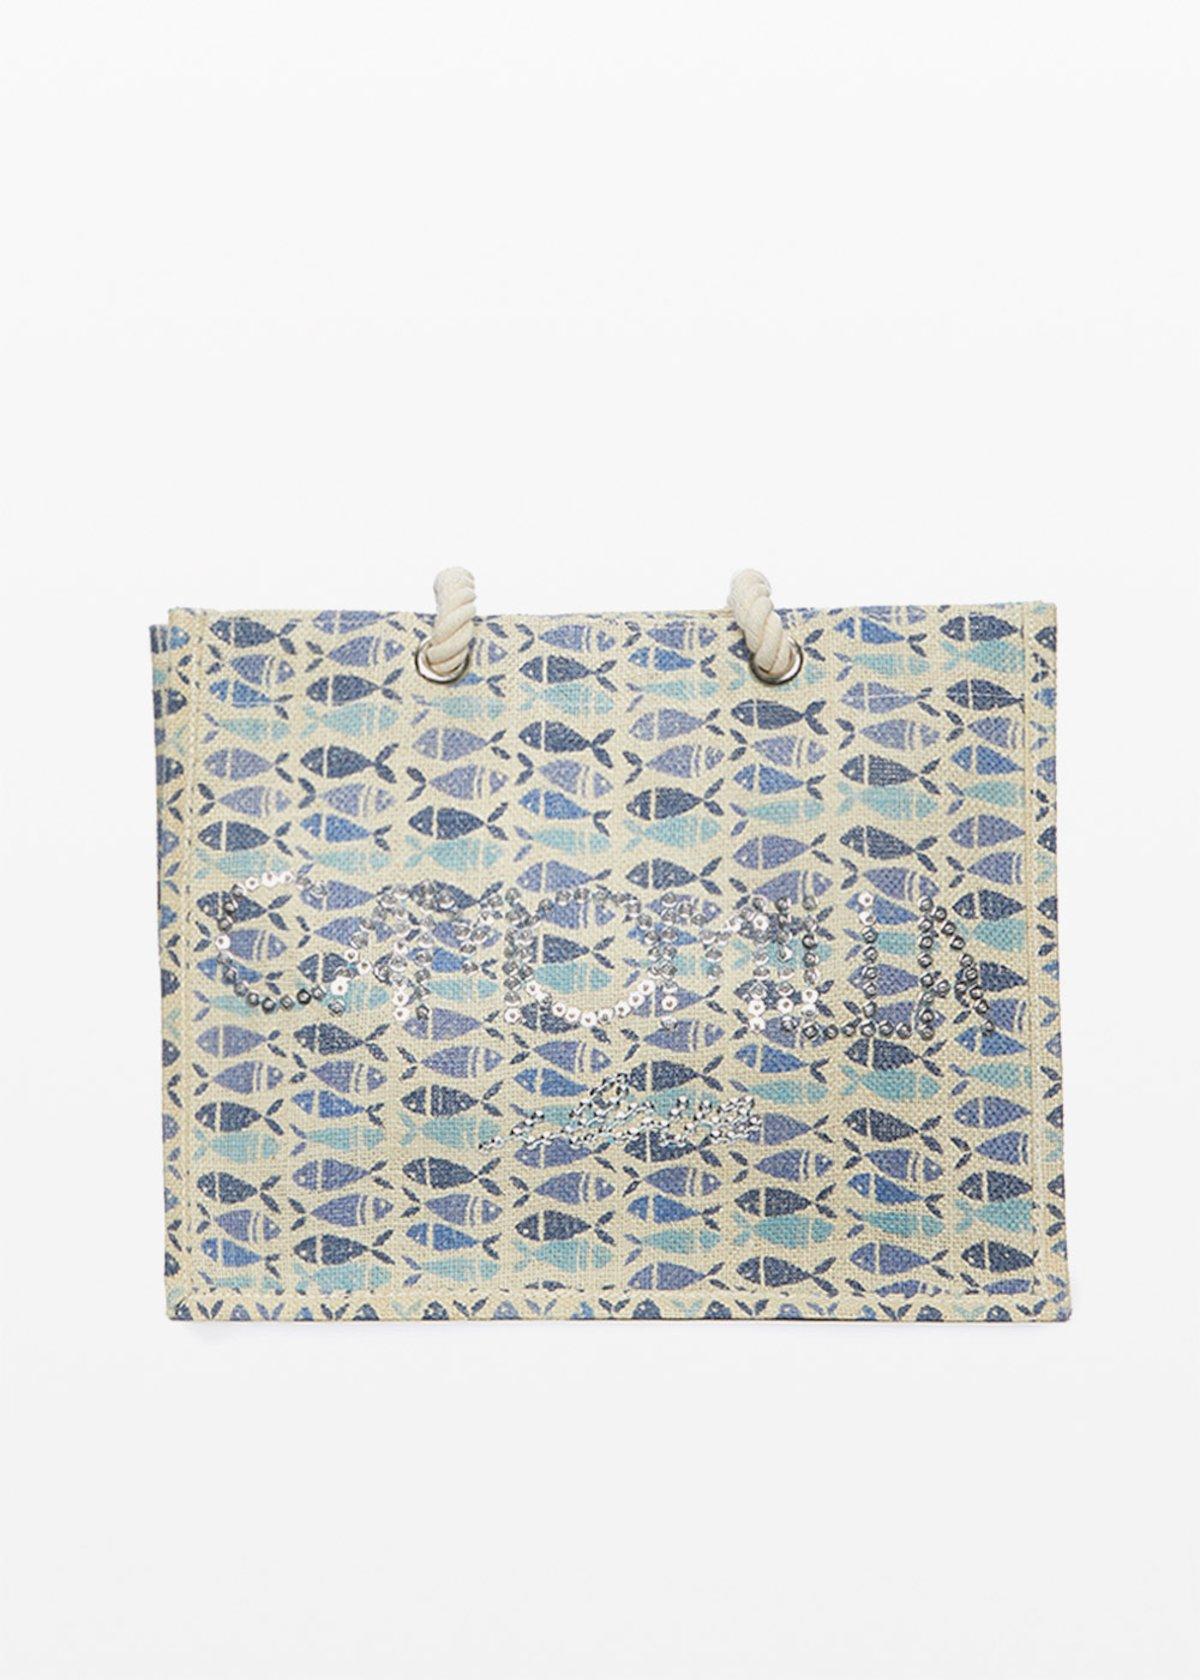 Jute bag Bitty fish print con logo Camomilla ilove in paillettes - Light Beige / Avion Fantasia - Woman - Category image